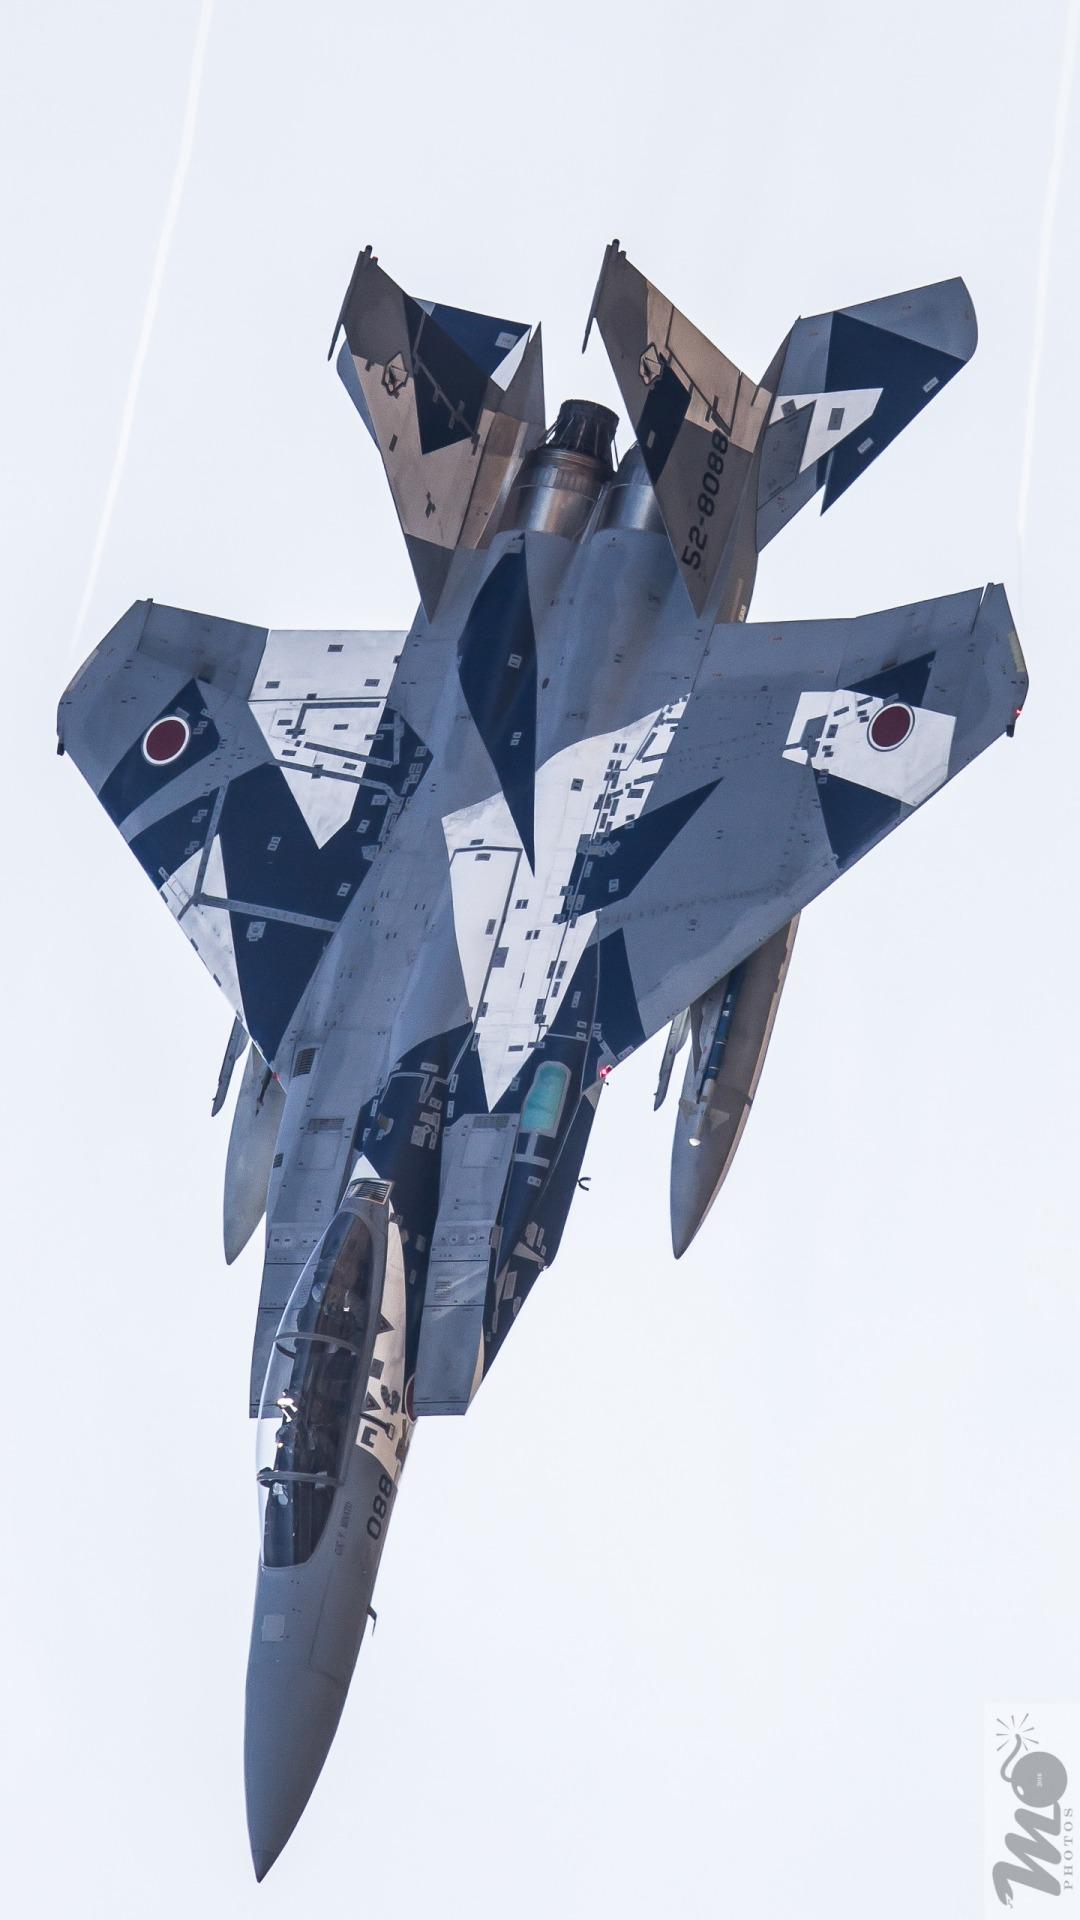 F-15 Eagle, Japan Air Self-Defense Force